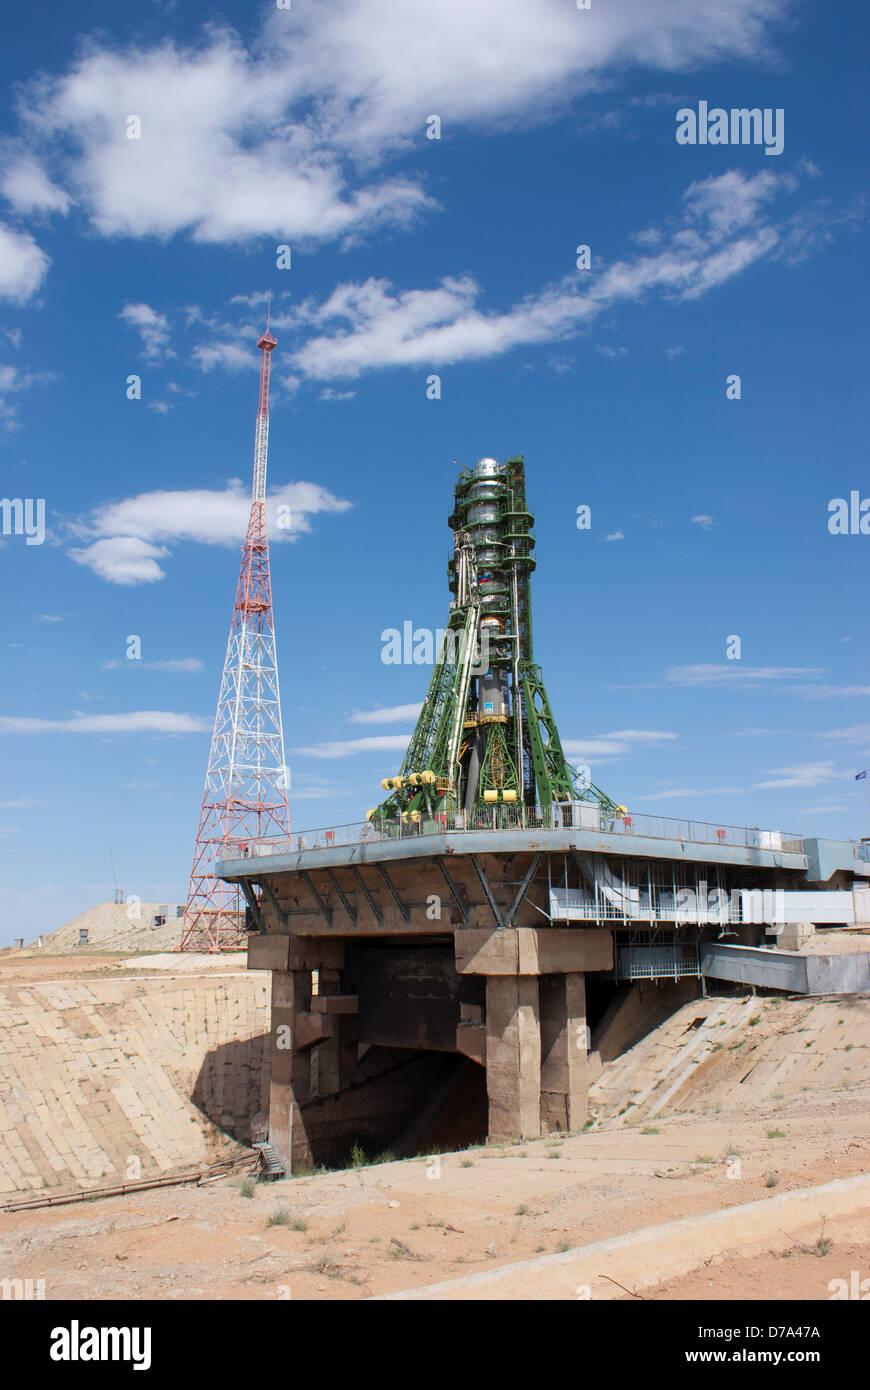 Soyuz rocket on launch pad at Baikonur Cosmodrome Kazakhstan - Stock Image